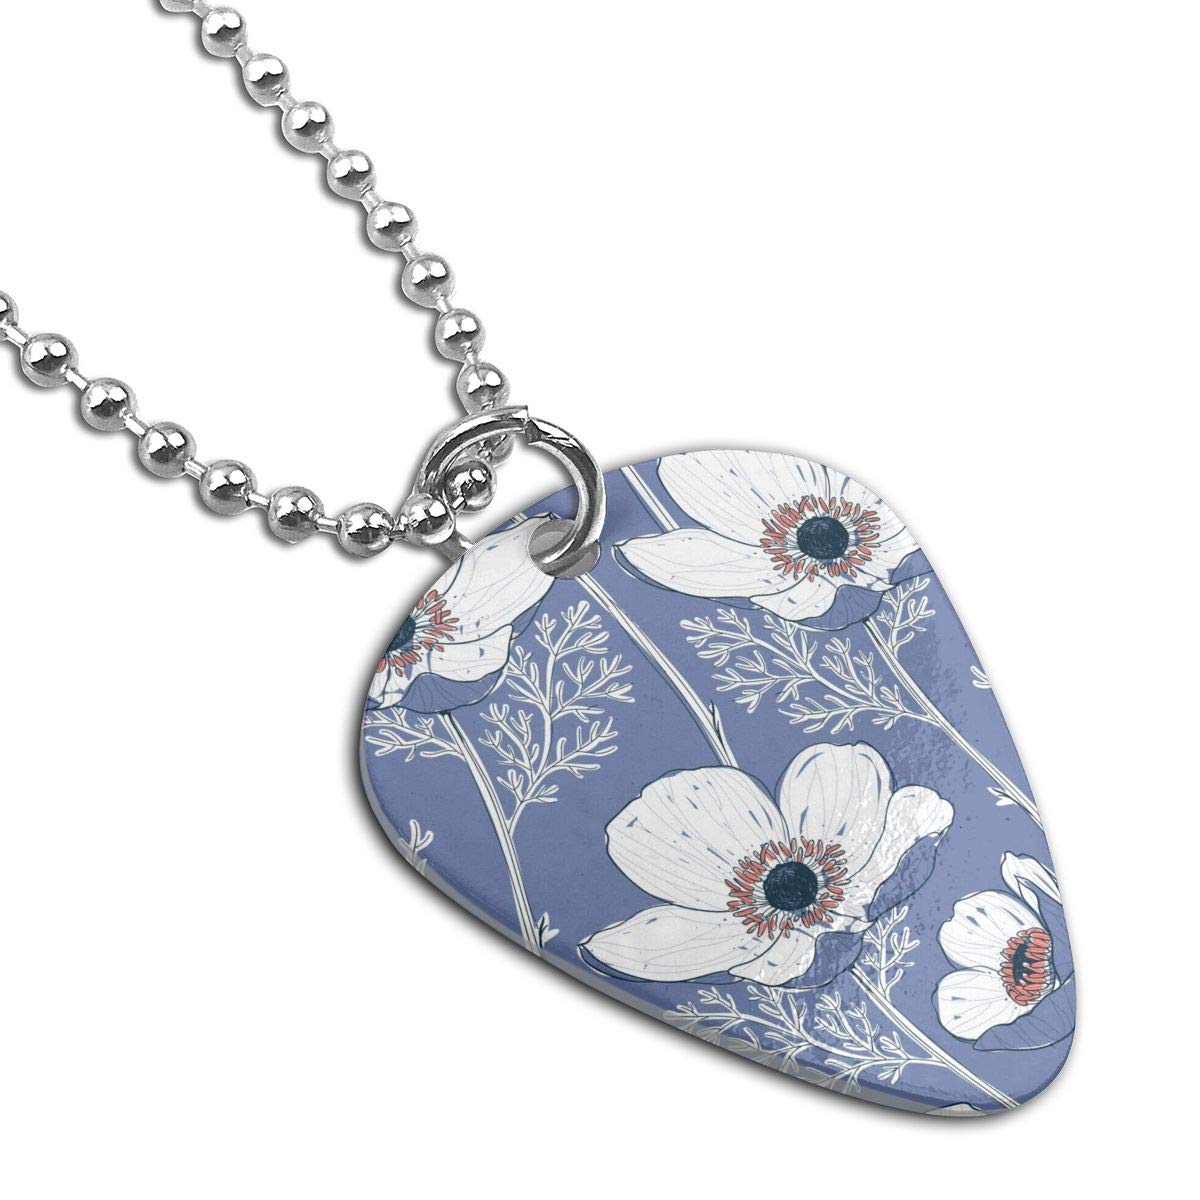 Hand Drawn Anemone Flowers Custom Guitar Pick Pendant Necklace Keychain